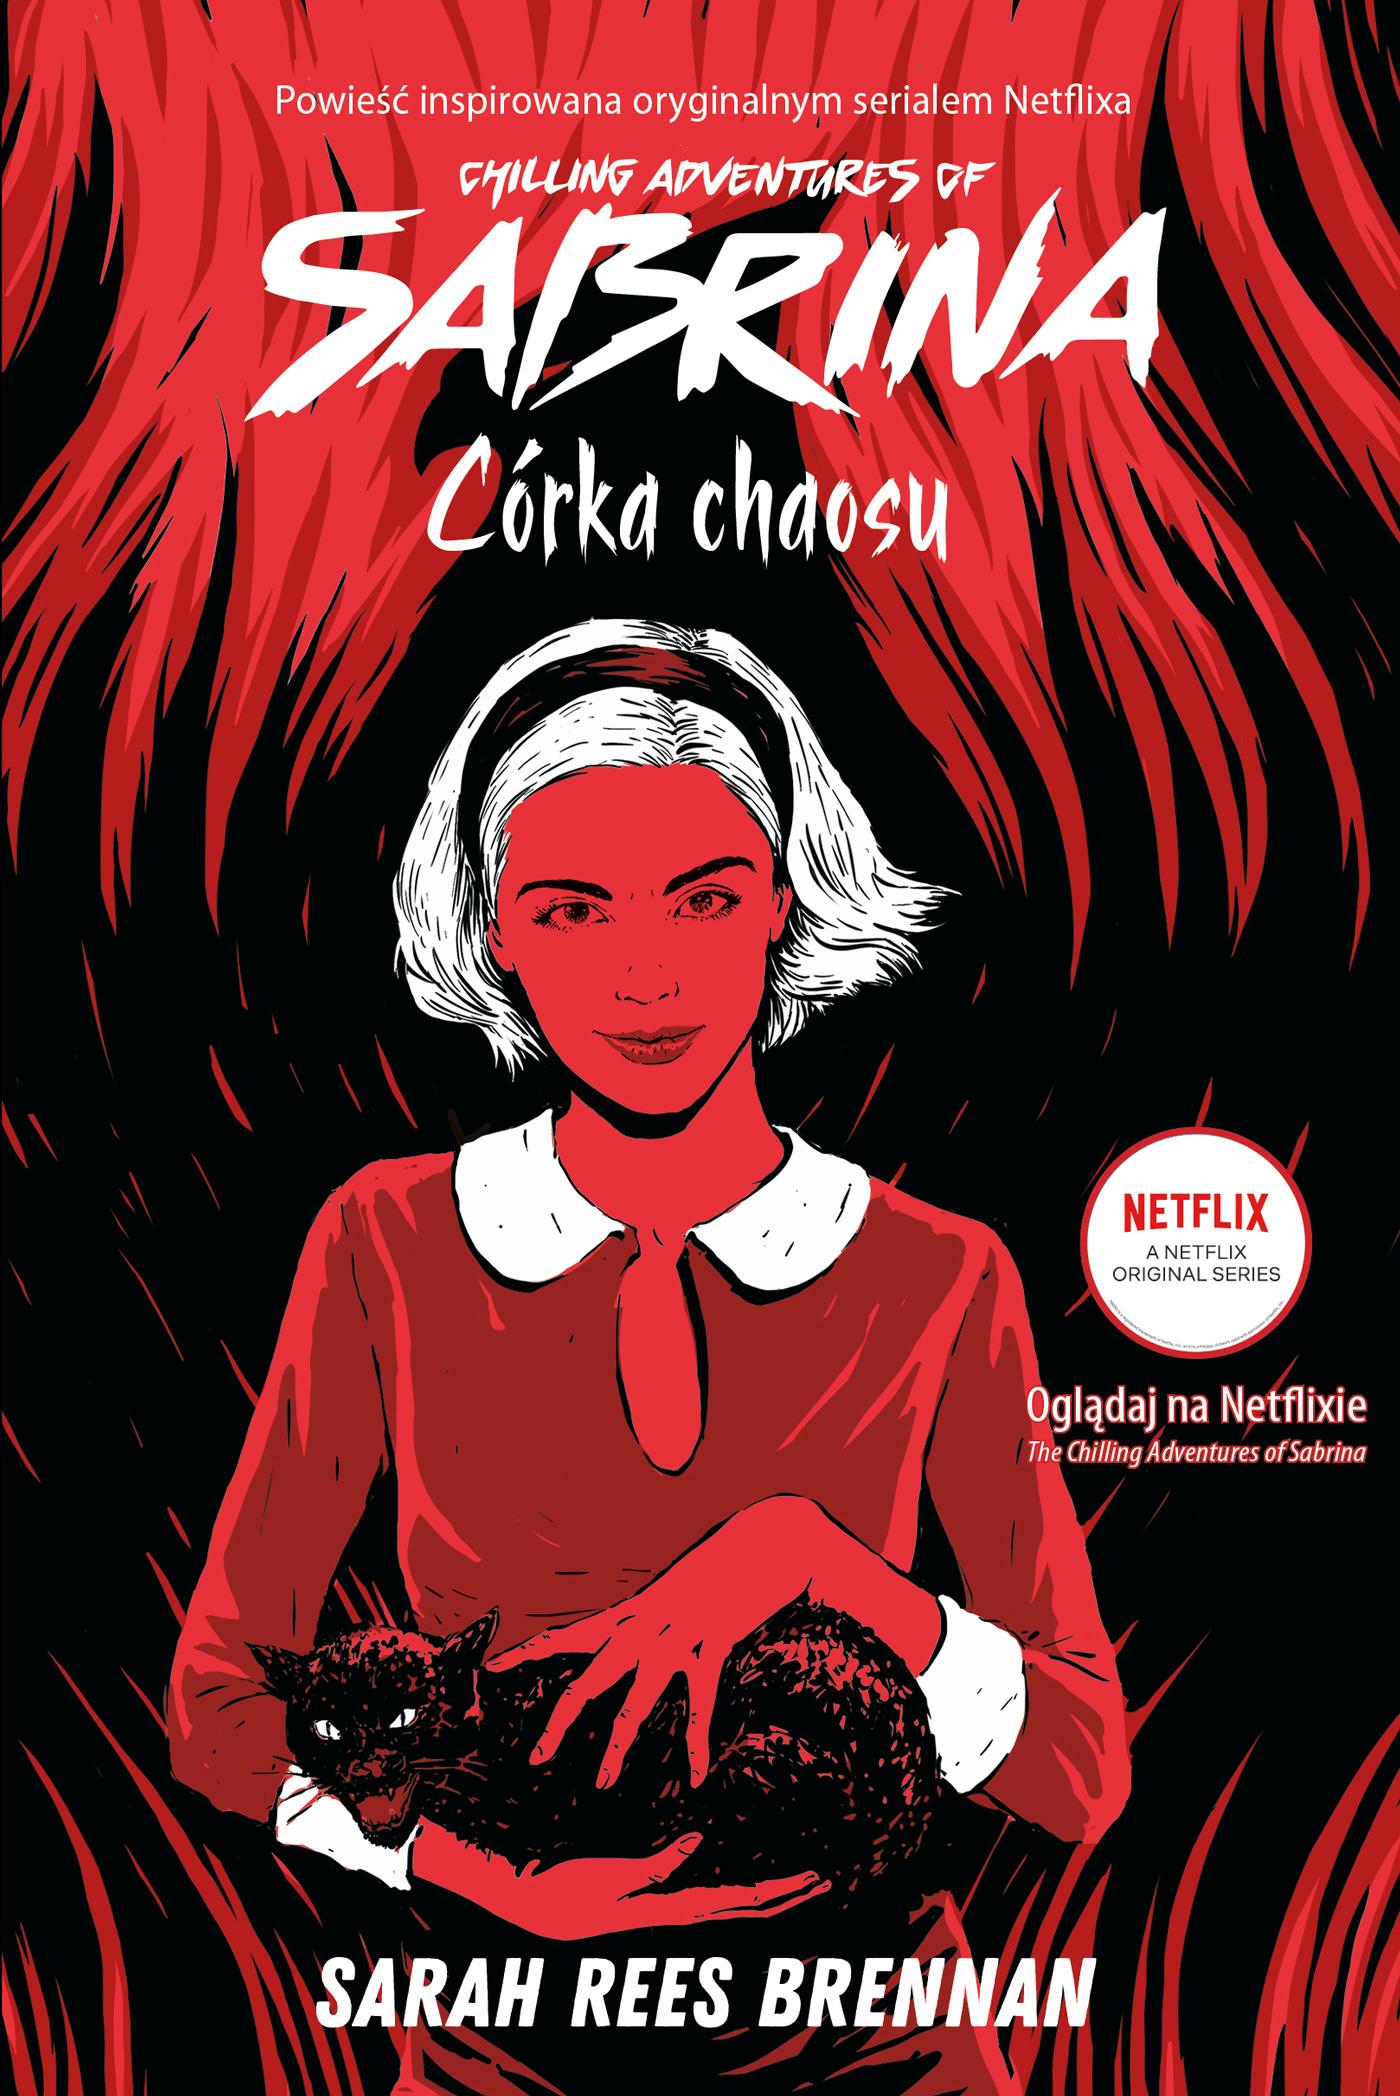 Chilling Adventures of Sabrina. Córka chaosu